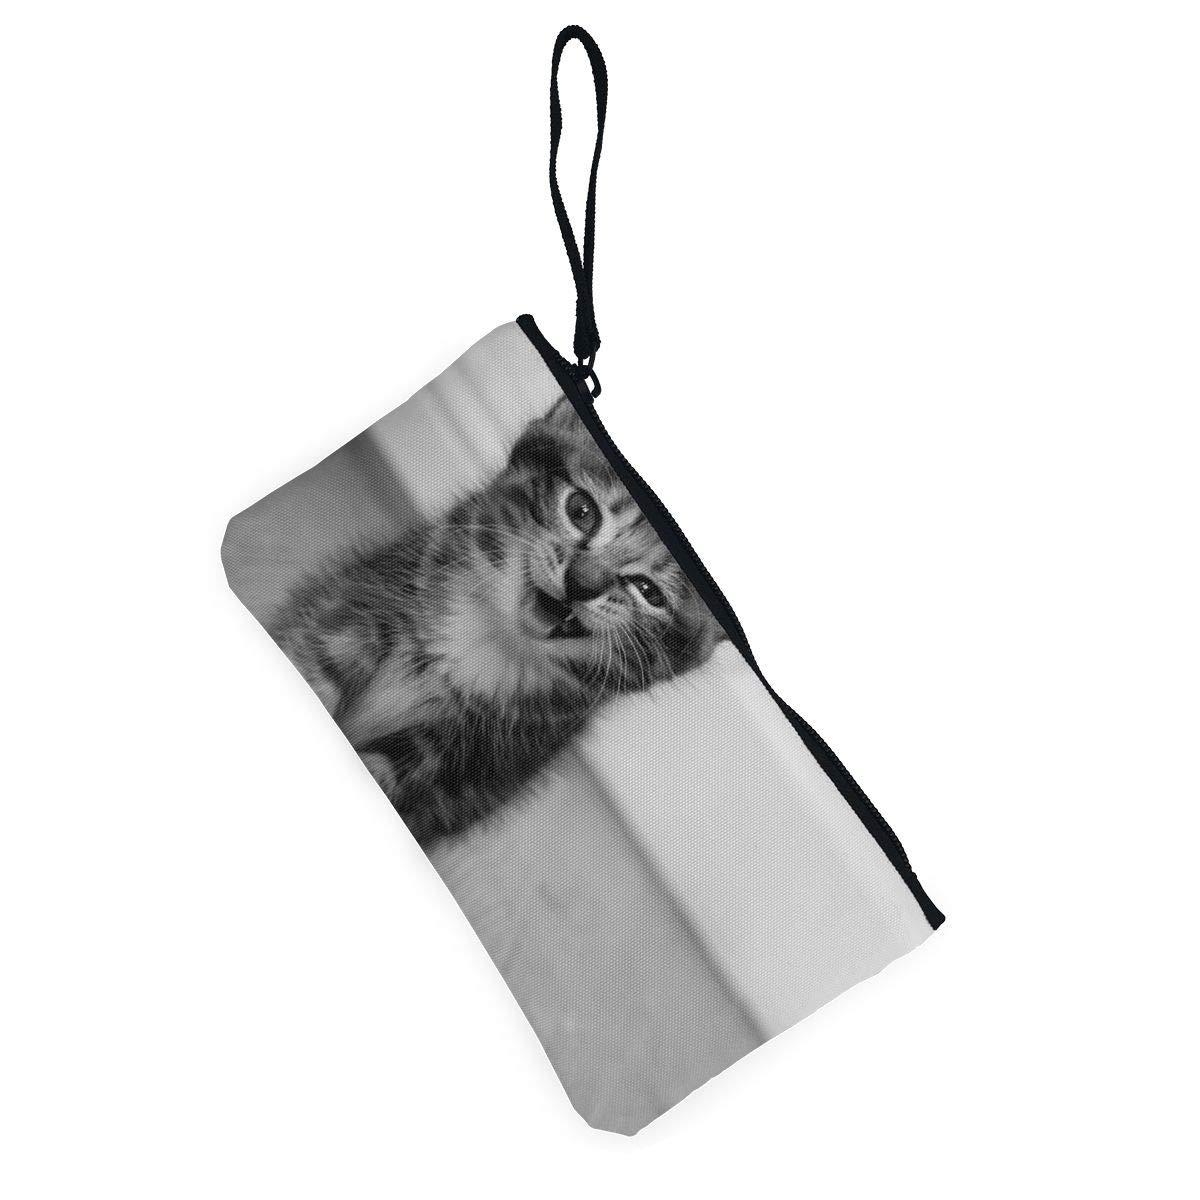 Canvas Cash Coin Purse,Cute Kitten Print Make Up Bag Zipper Small Purse Wallets